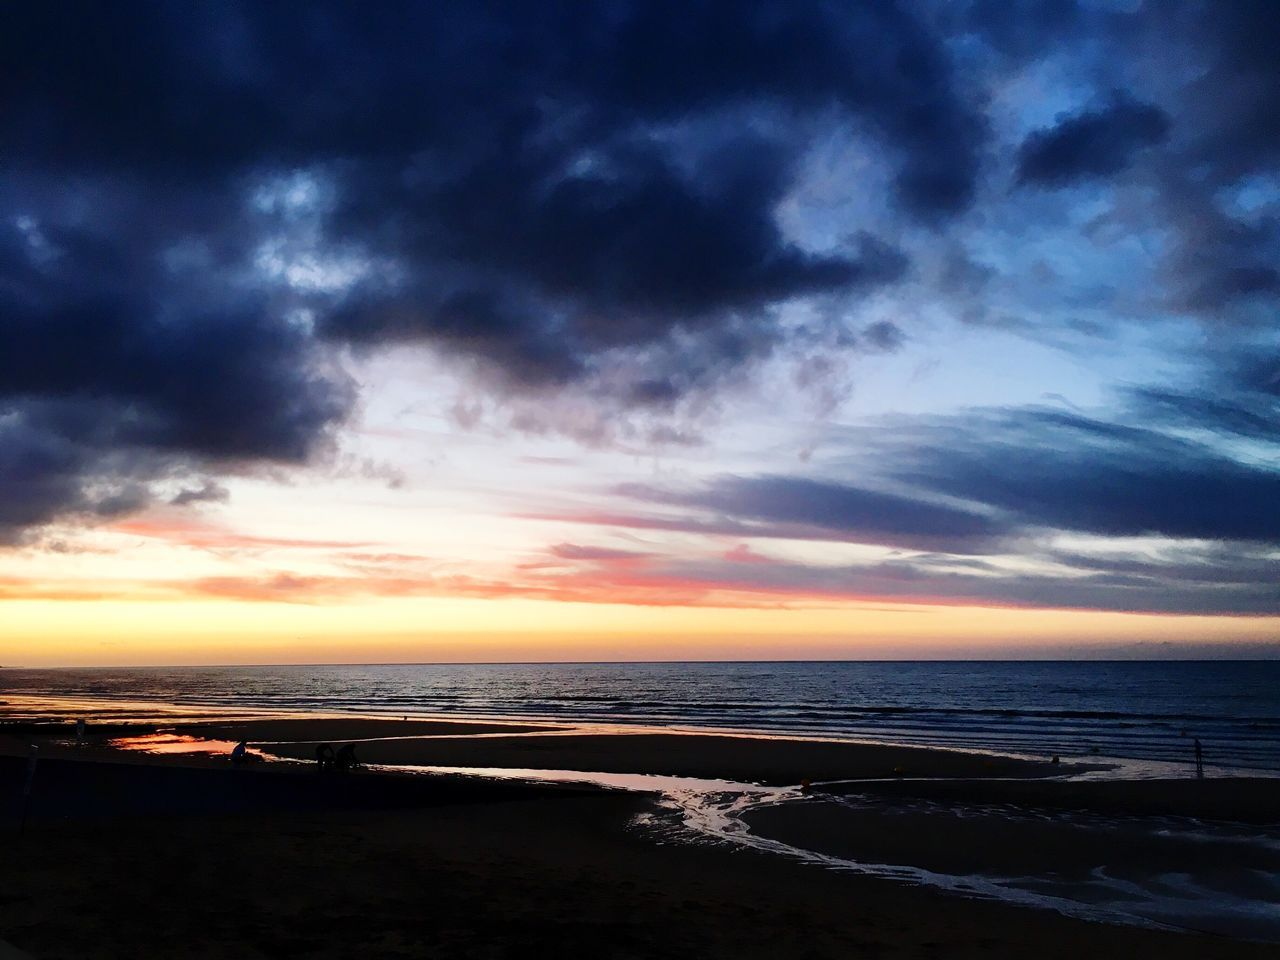 Dramatic Sky Over Calm Sea